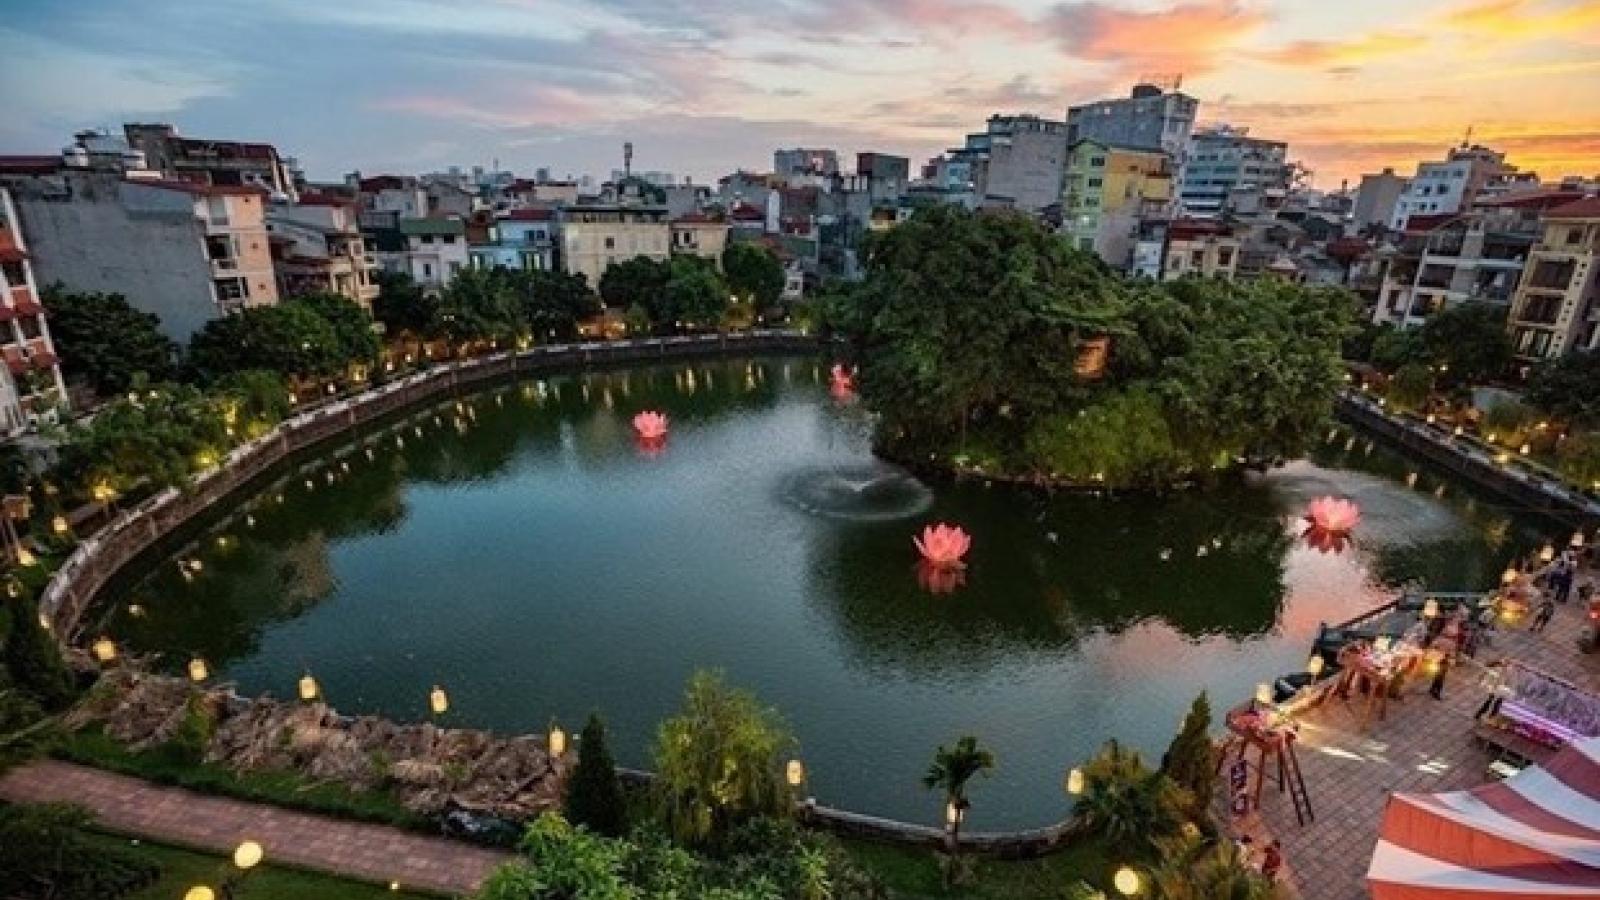 Hanoi to restore cultural values of lake in Temple of Literature complex